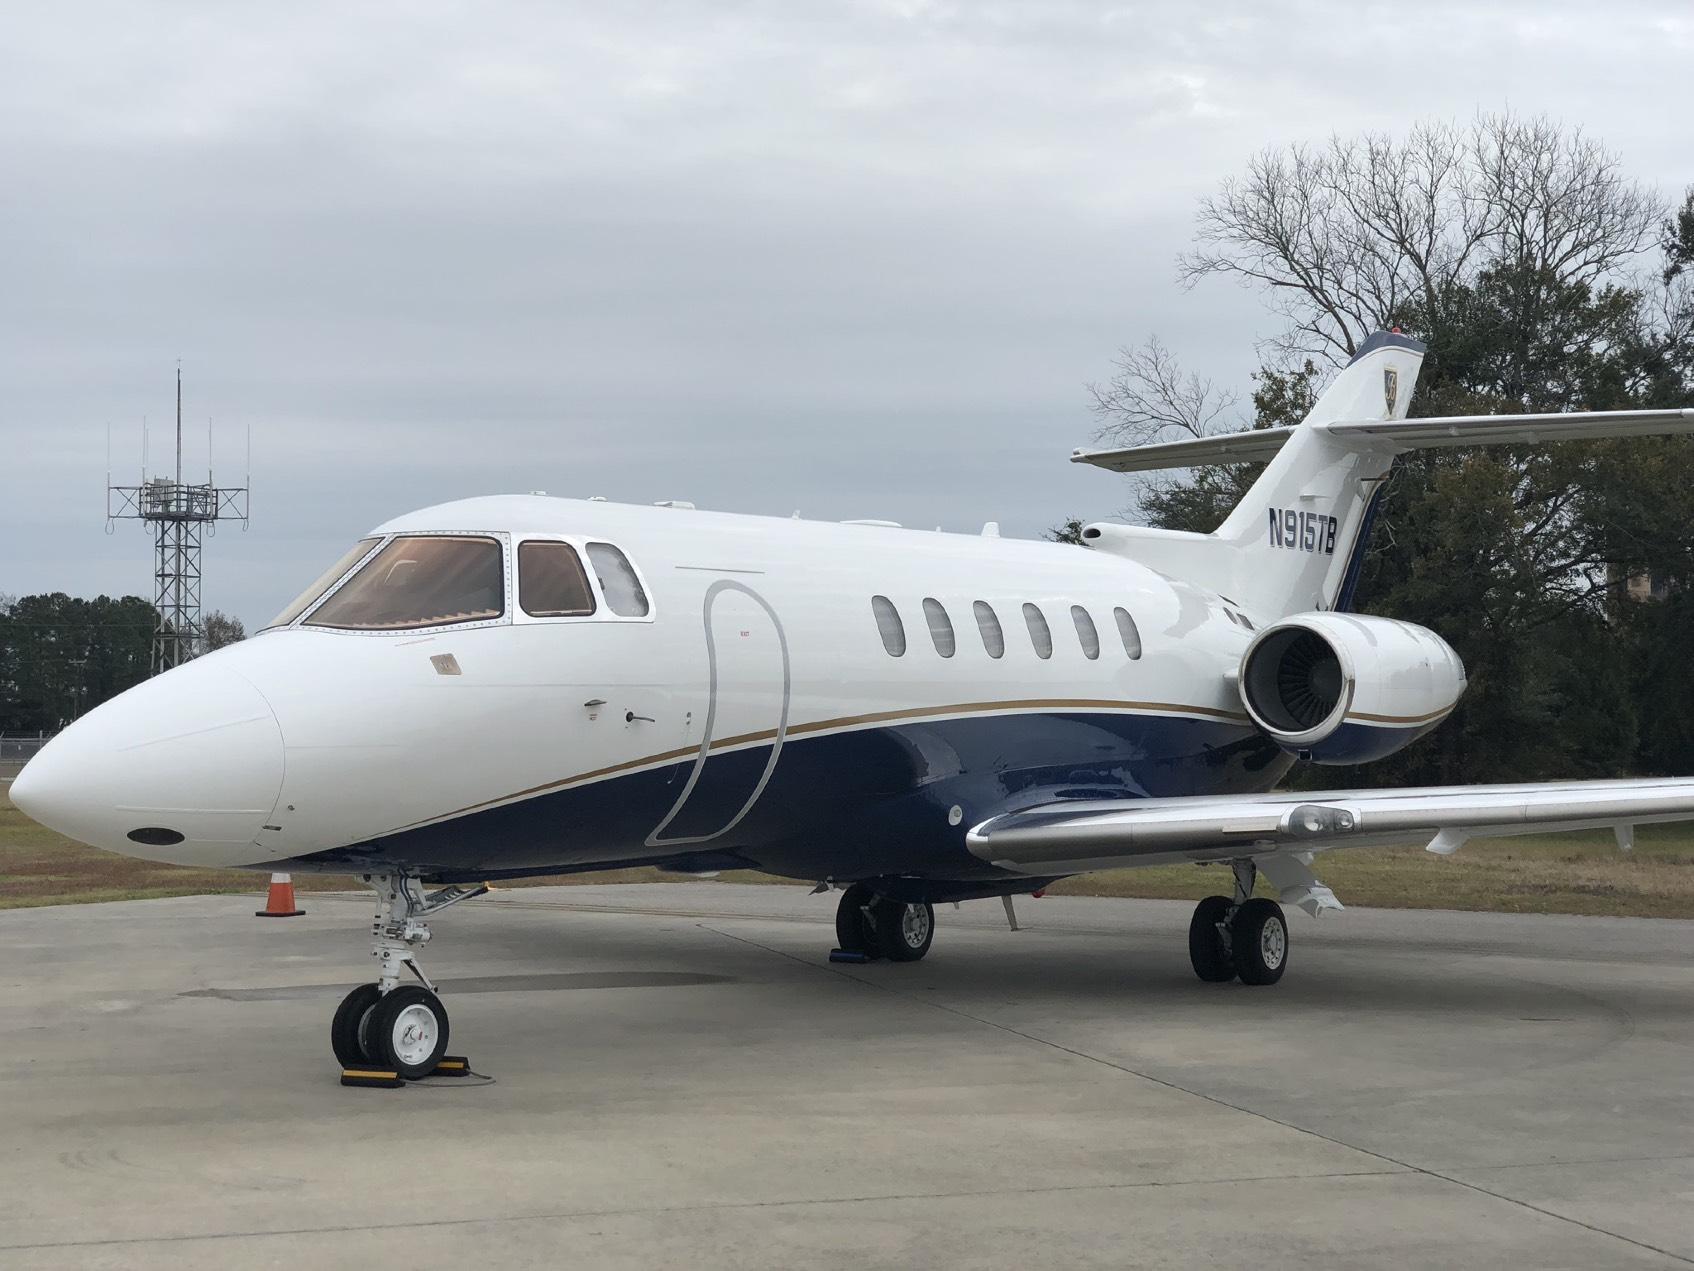 https://resources.globalair.com/aircraftforsale/images/ads/original/83501_07_hawker850xp_sn258822_e1.jpg